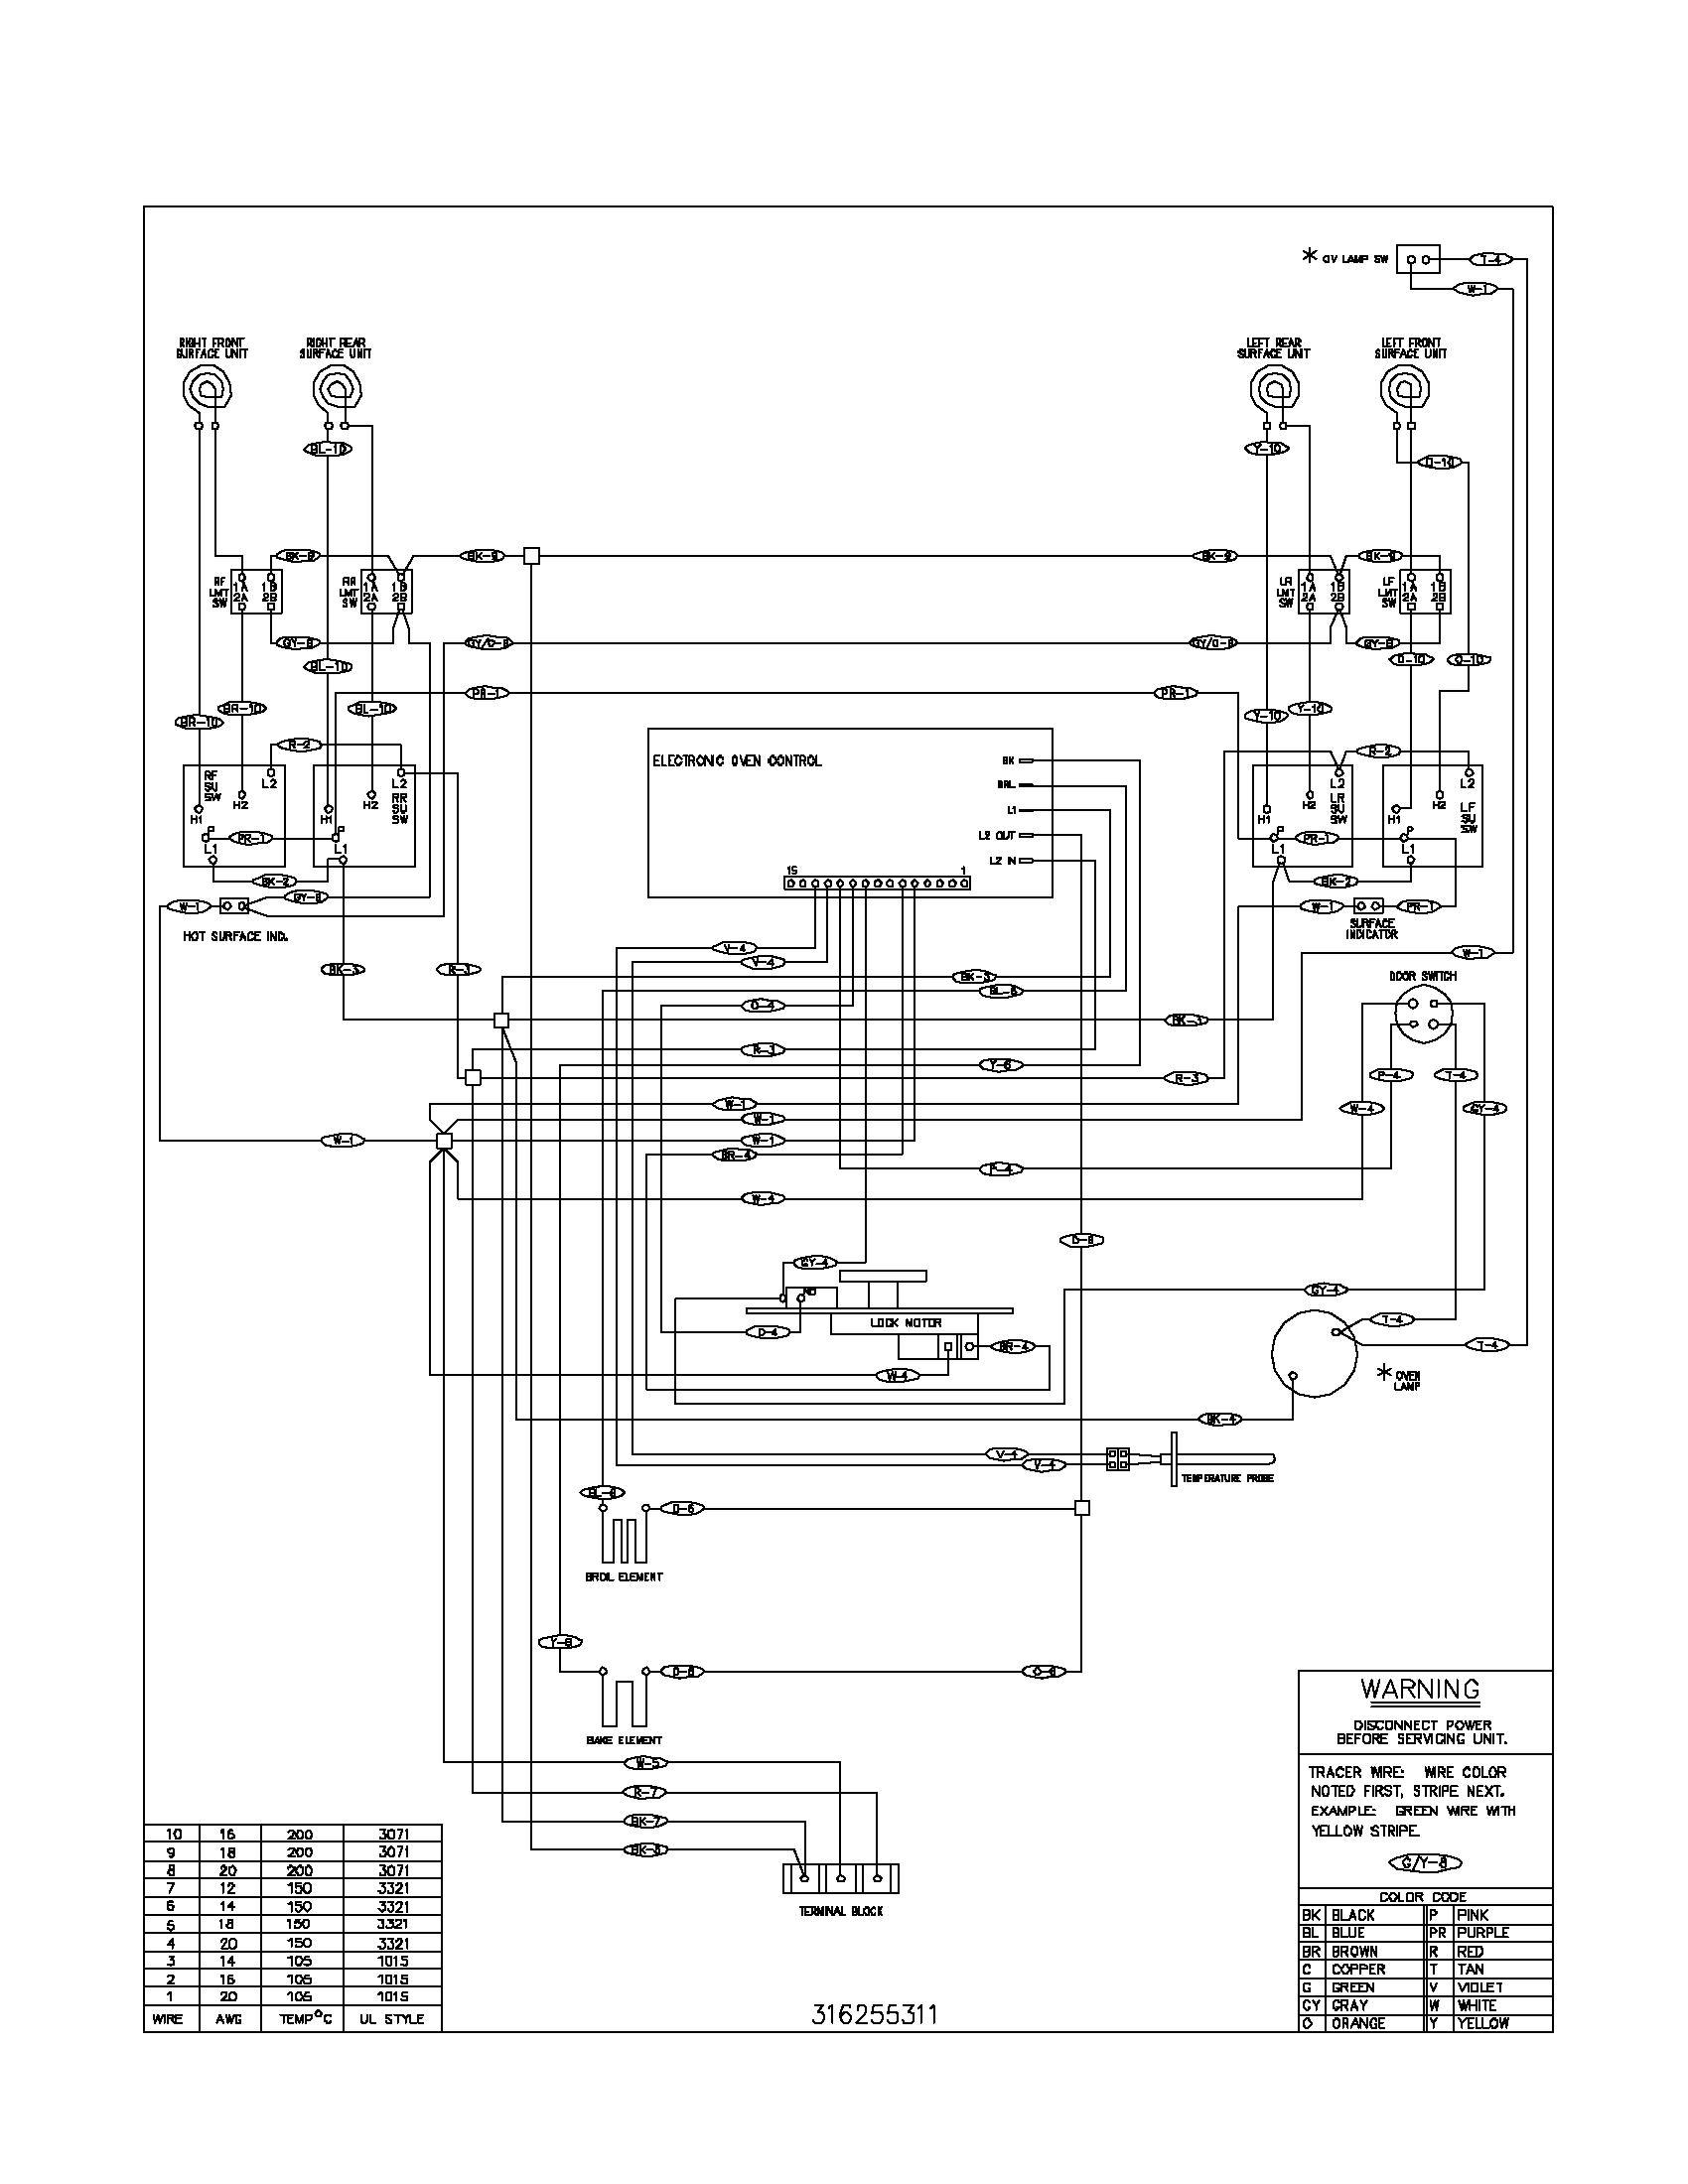 Wiring Diagram For Ge Range - Wiring Diagram For 2008 Chevy Suburban -  plymouth.yenpancane.jeanjaures37.fr   Ge Electric Range Wiring Diagram      Wiring Diagram Resource